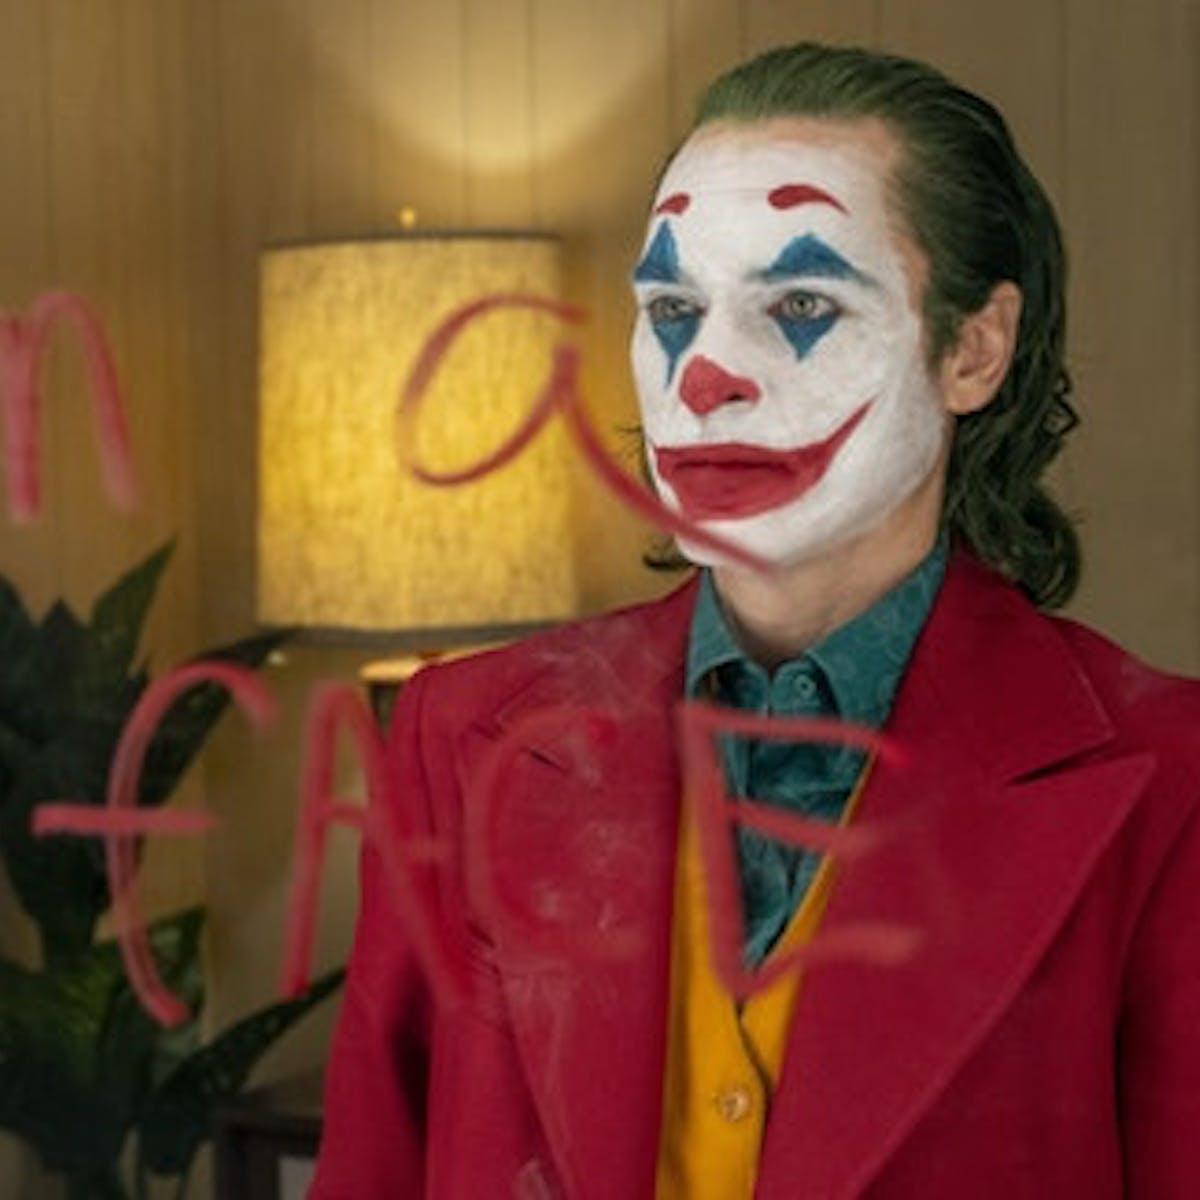 Skip 'Joker' this weekend to stream hits like 'Batman' or 'Blade' instead